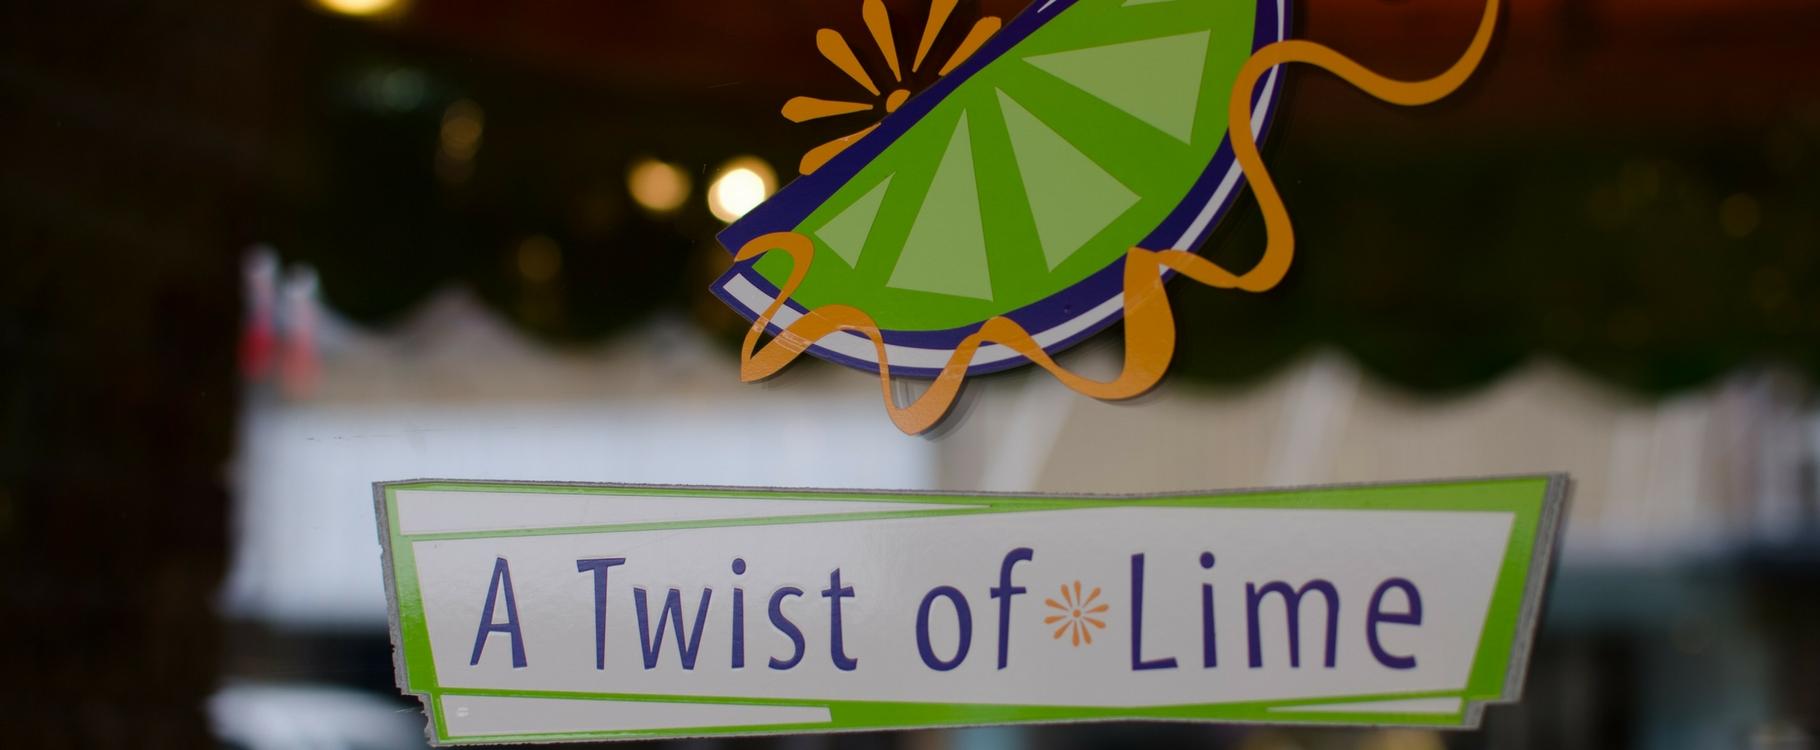 A Twist of Lime Downtown McKinney Texas Florist